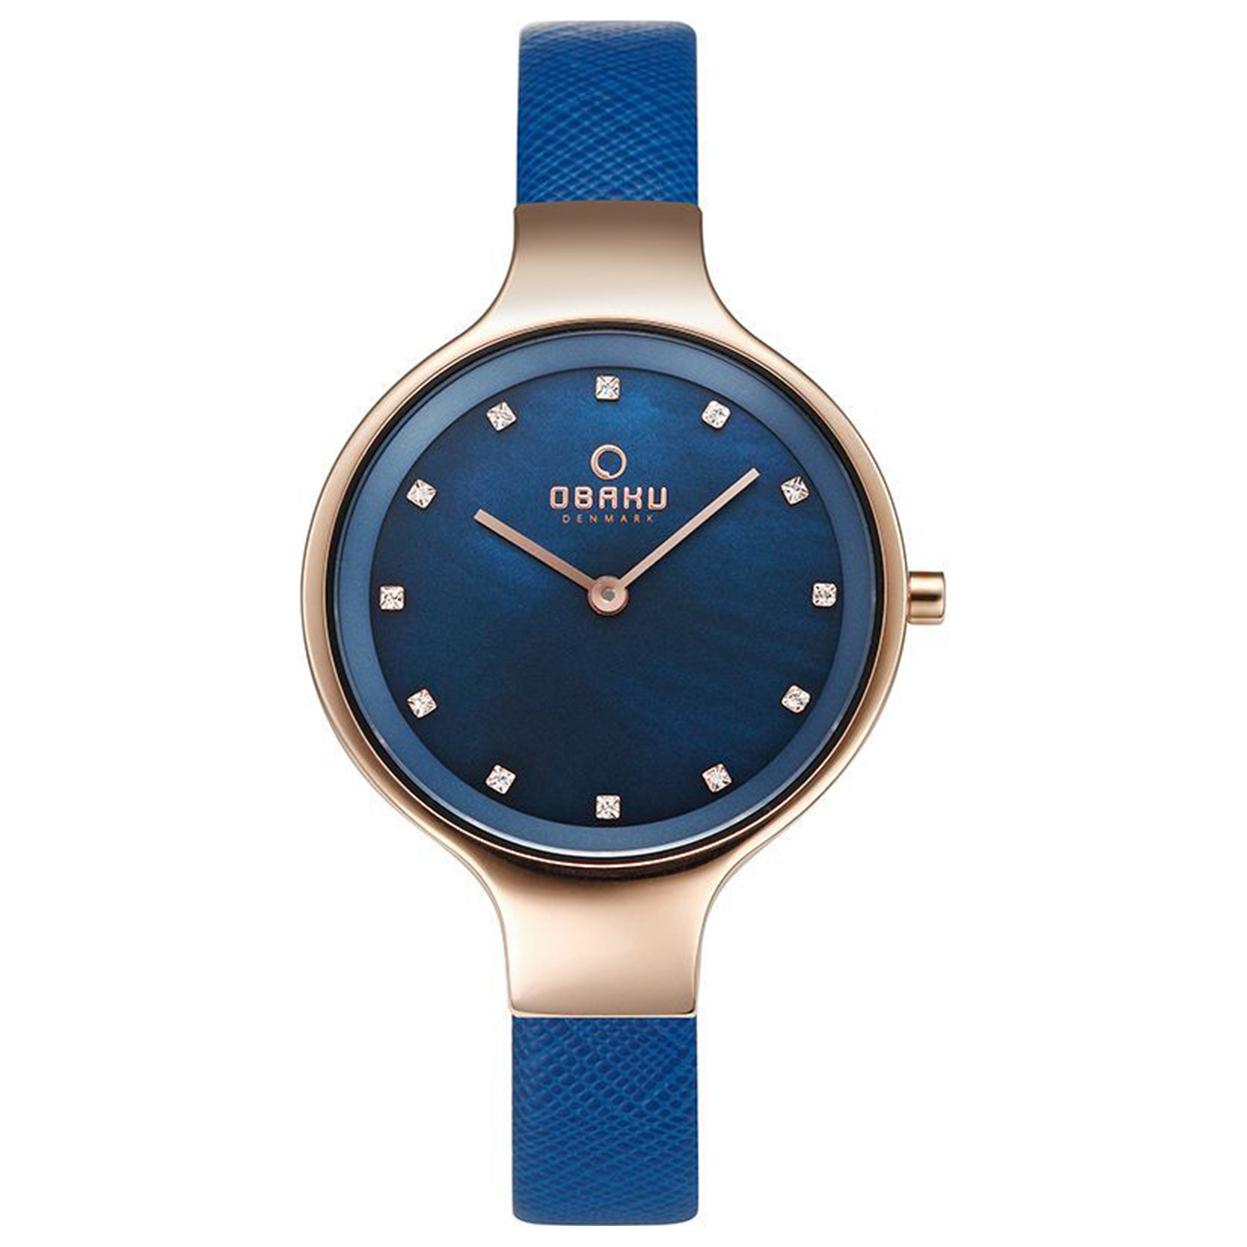 Zegarek Obaku V173LXVLRA - grawer na stalowej kopercie